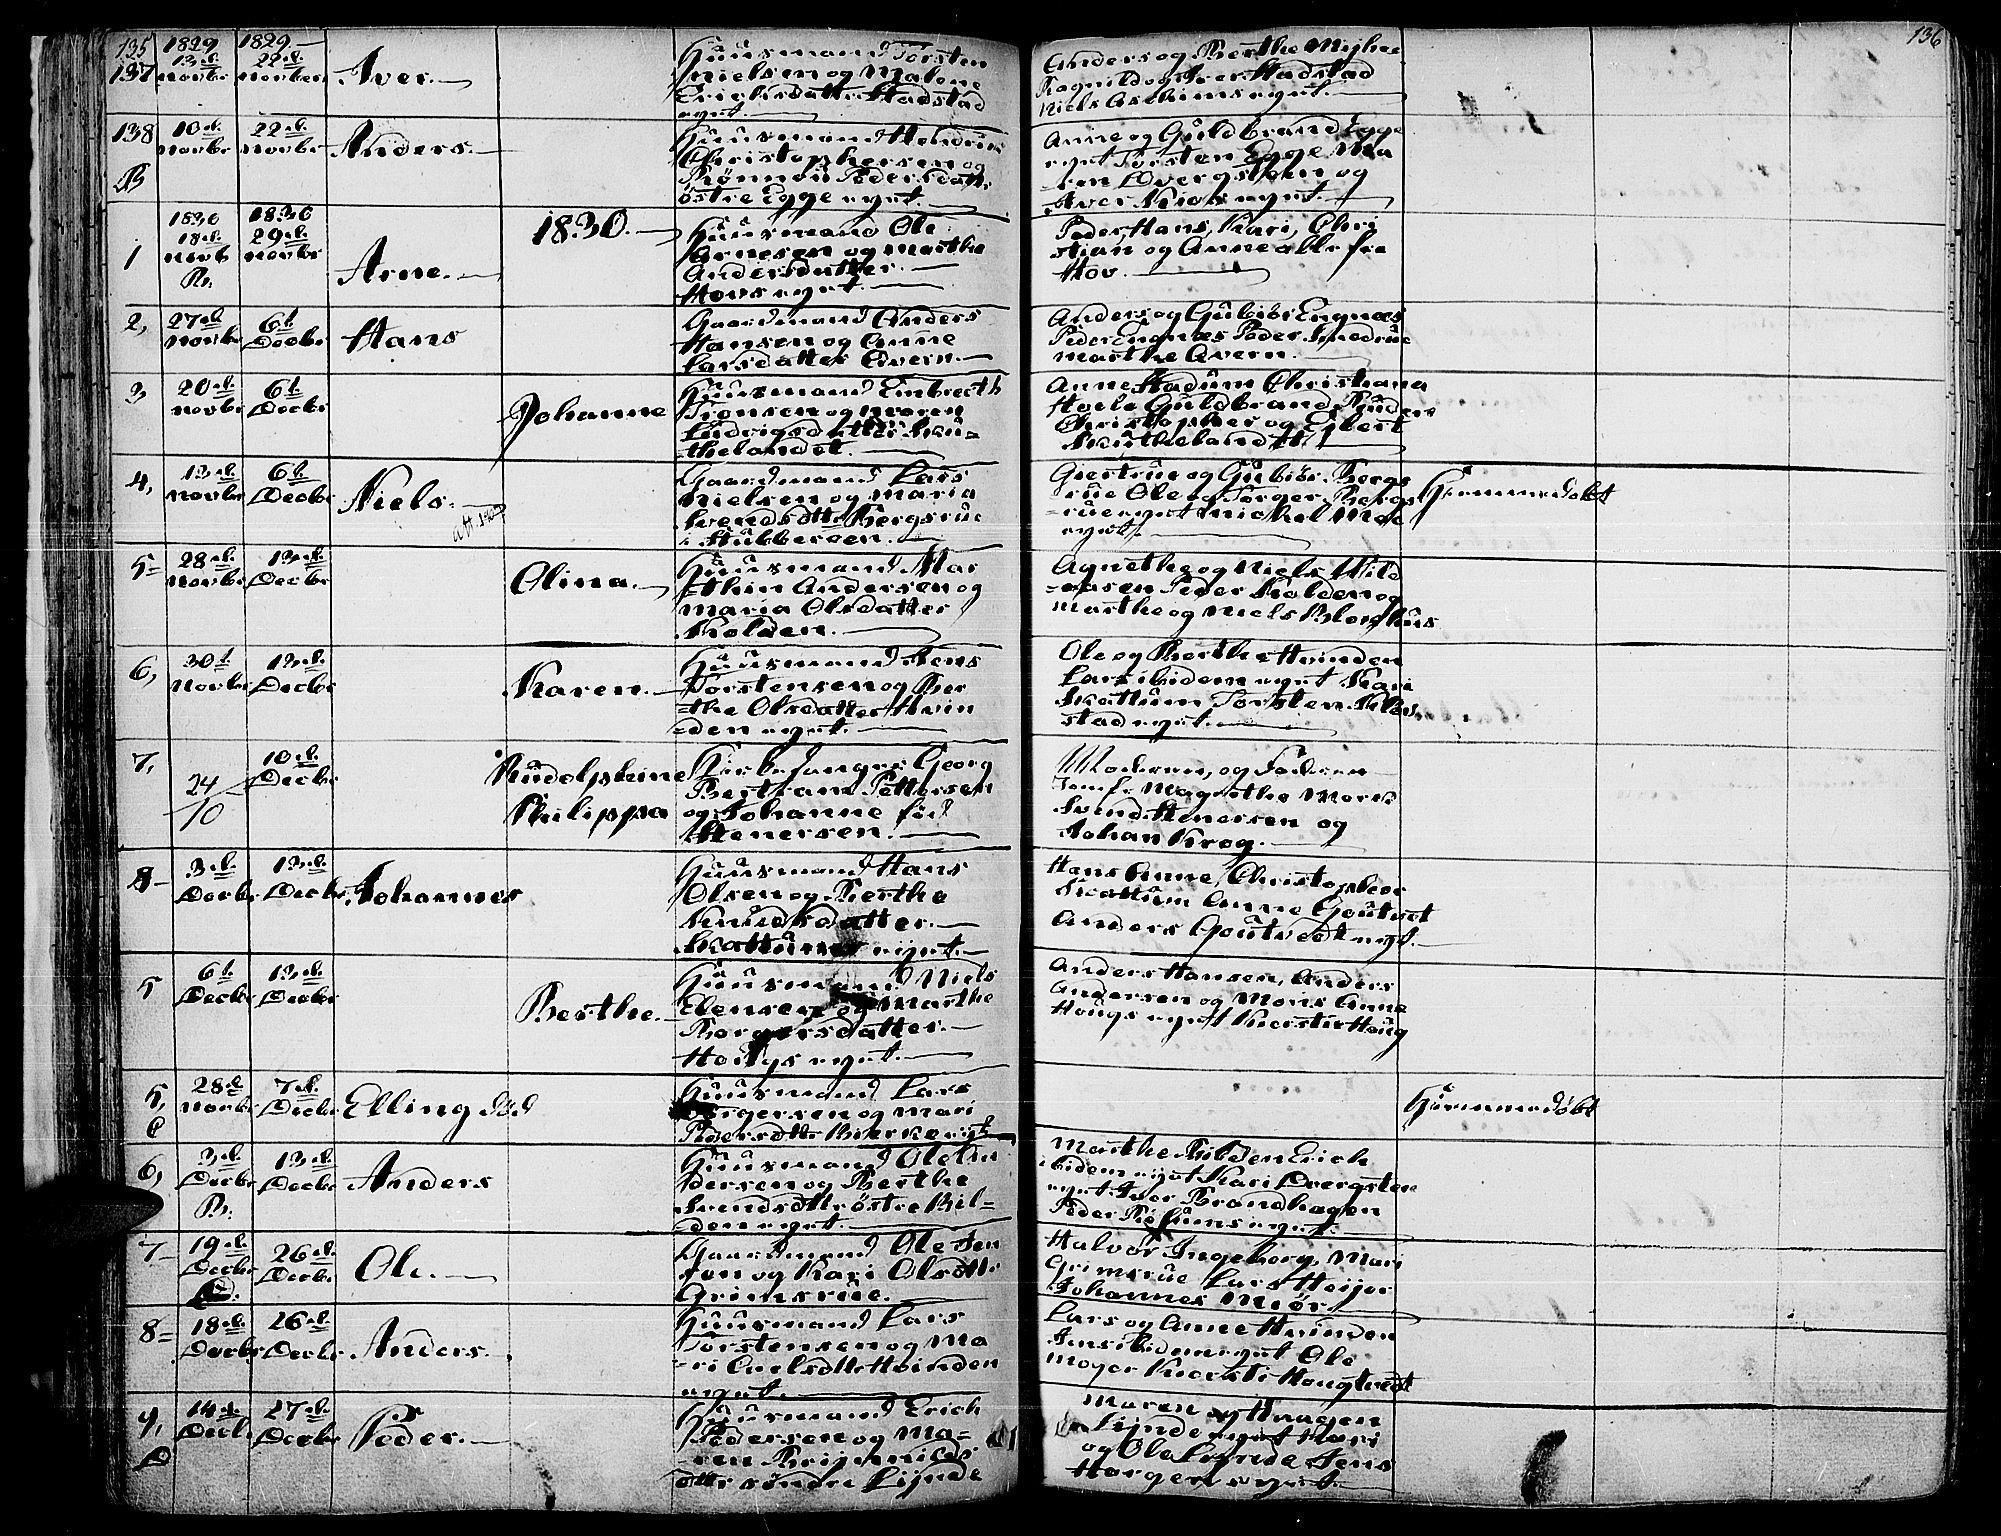 SAH, Gran prestekontor, Ministerialbok nr. 10, 1824-1842, s. 135-136